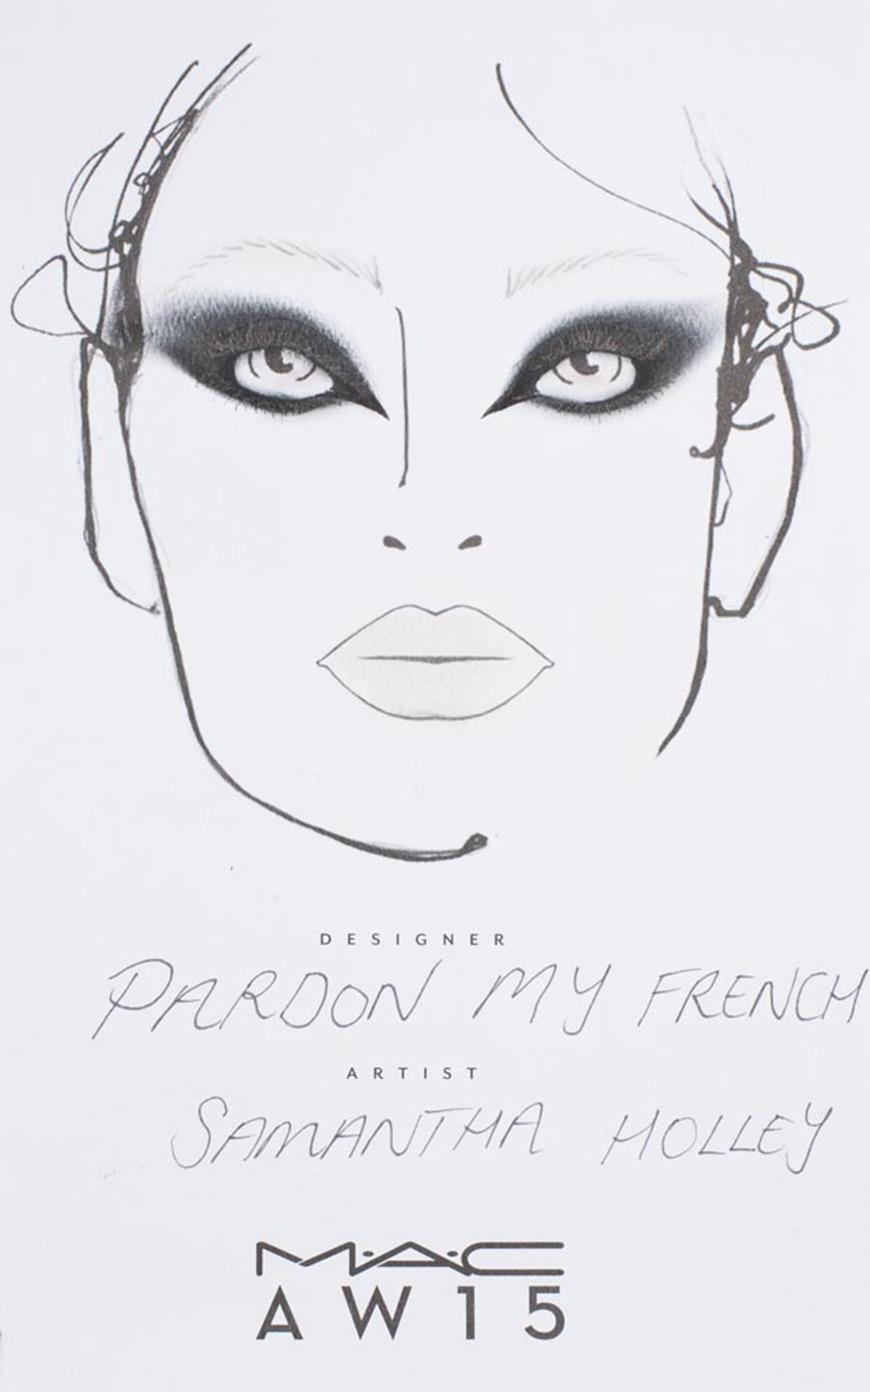 2_Pardon_My_French_Kelly_thompson_fashion_illustrator_NZFW.jpg